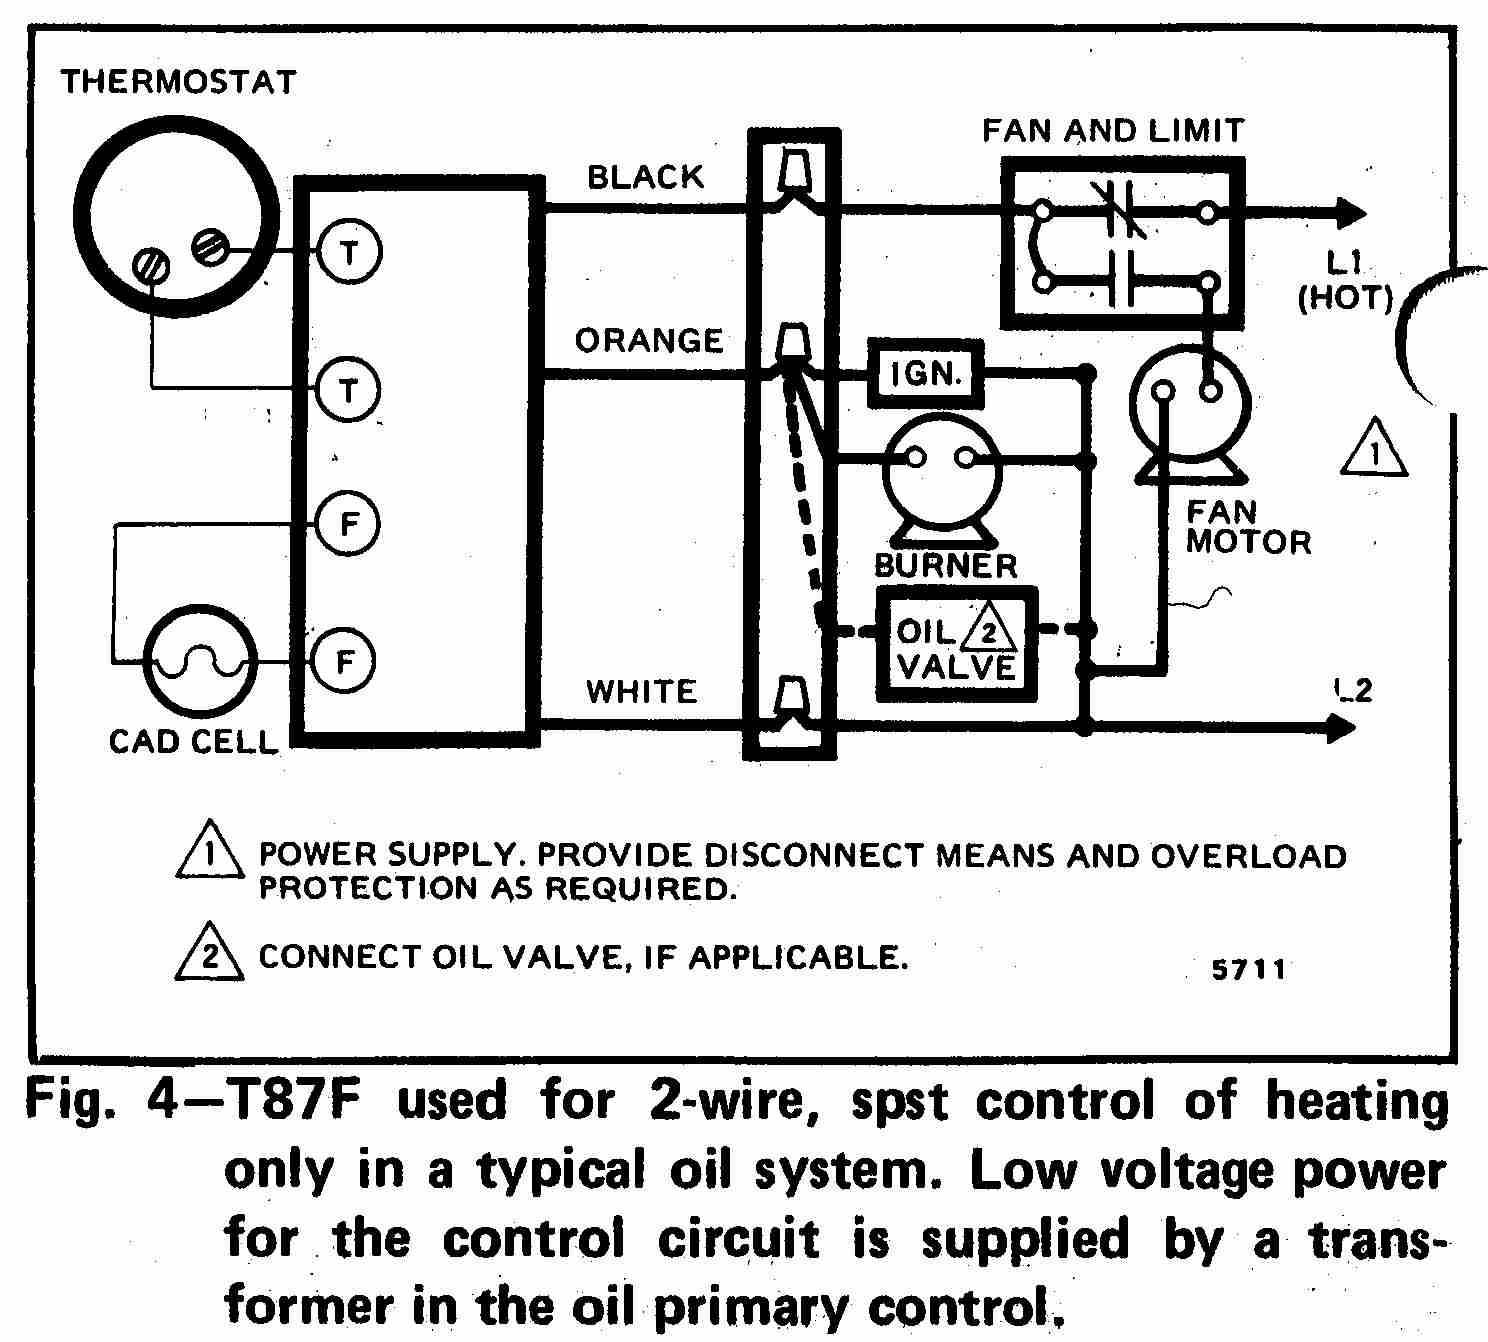 Enjoyable Hvac Low Voltage Wiring Wiring Diagram Wiring Cloud Ittabpendurdonanfuldomelitekicepsianuembamohammedshrineorg